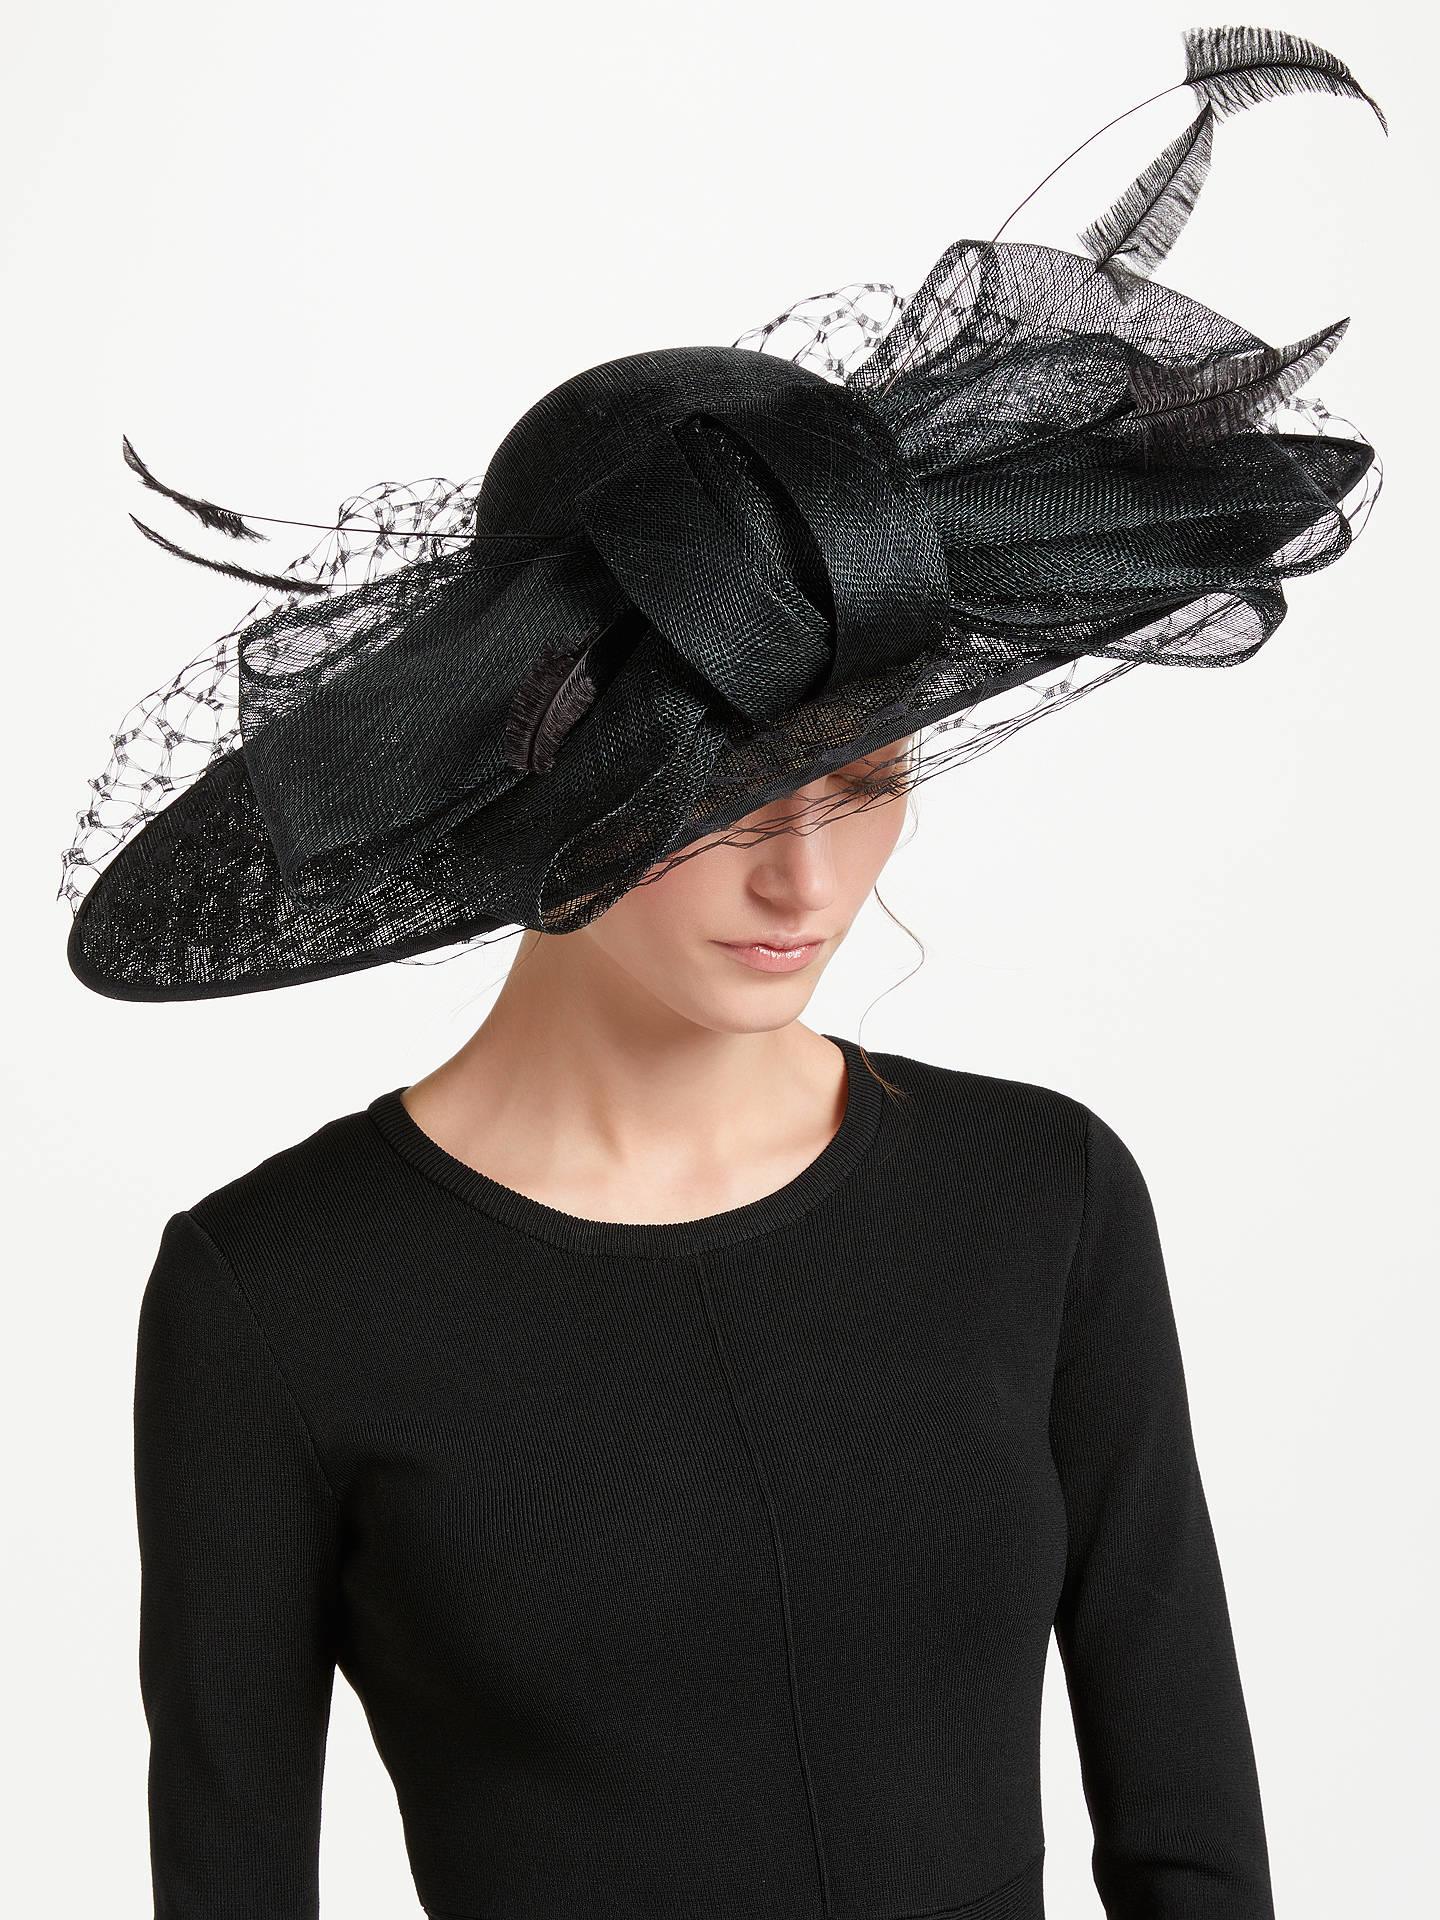 027d60efc6550 Buy Nigel Rayment Ada Large Veil Down Brim Occasion Hat